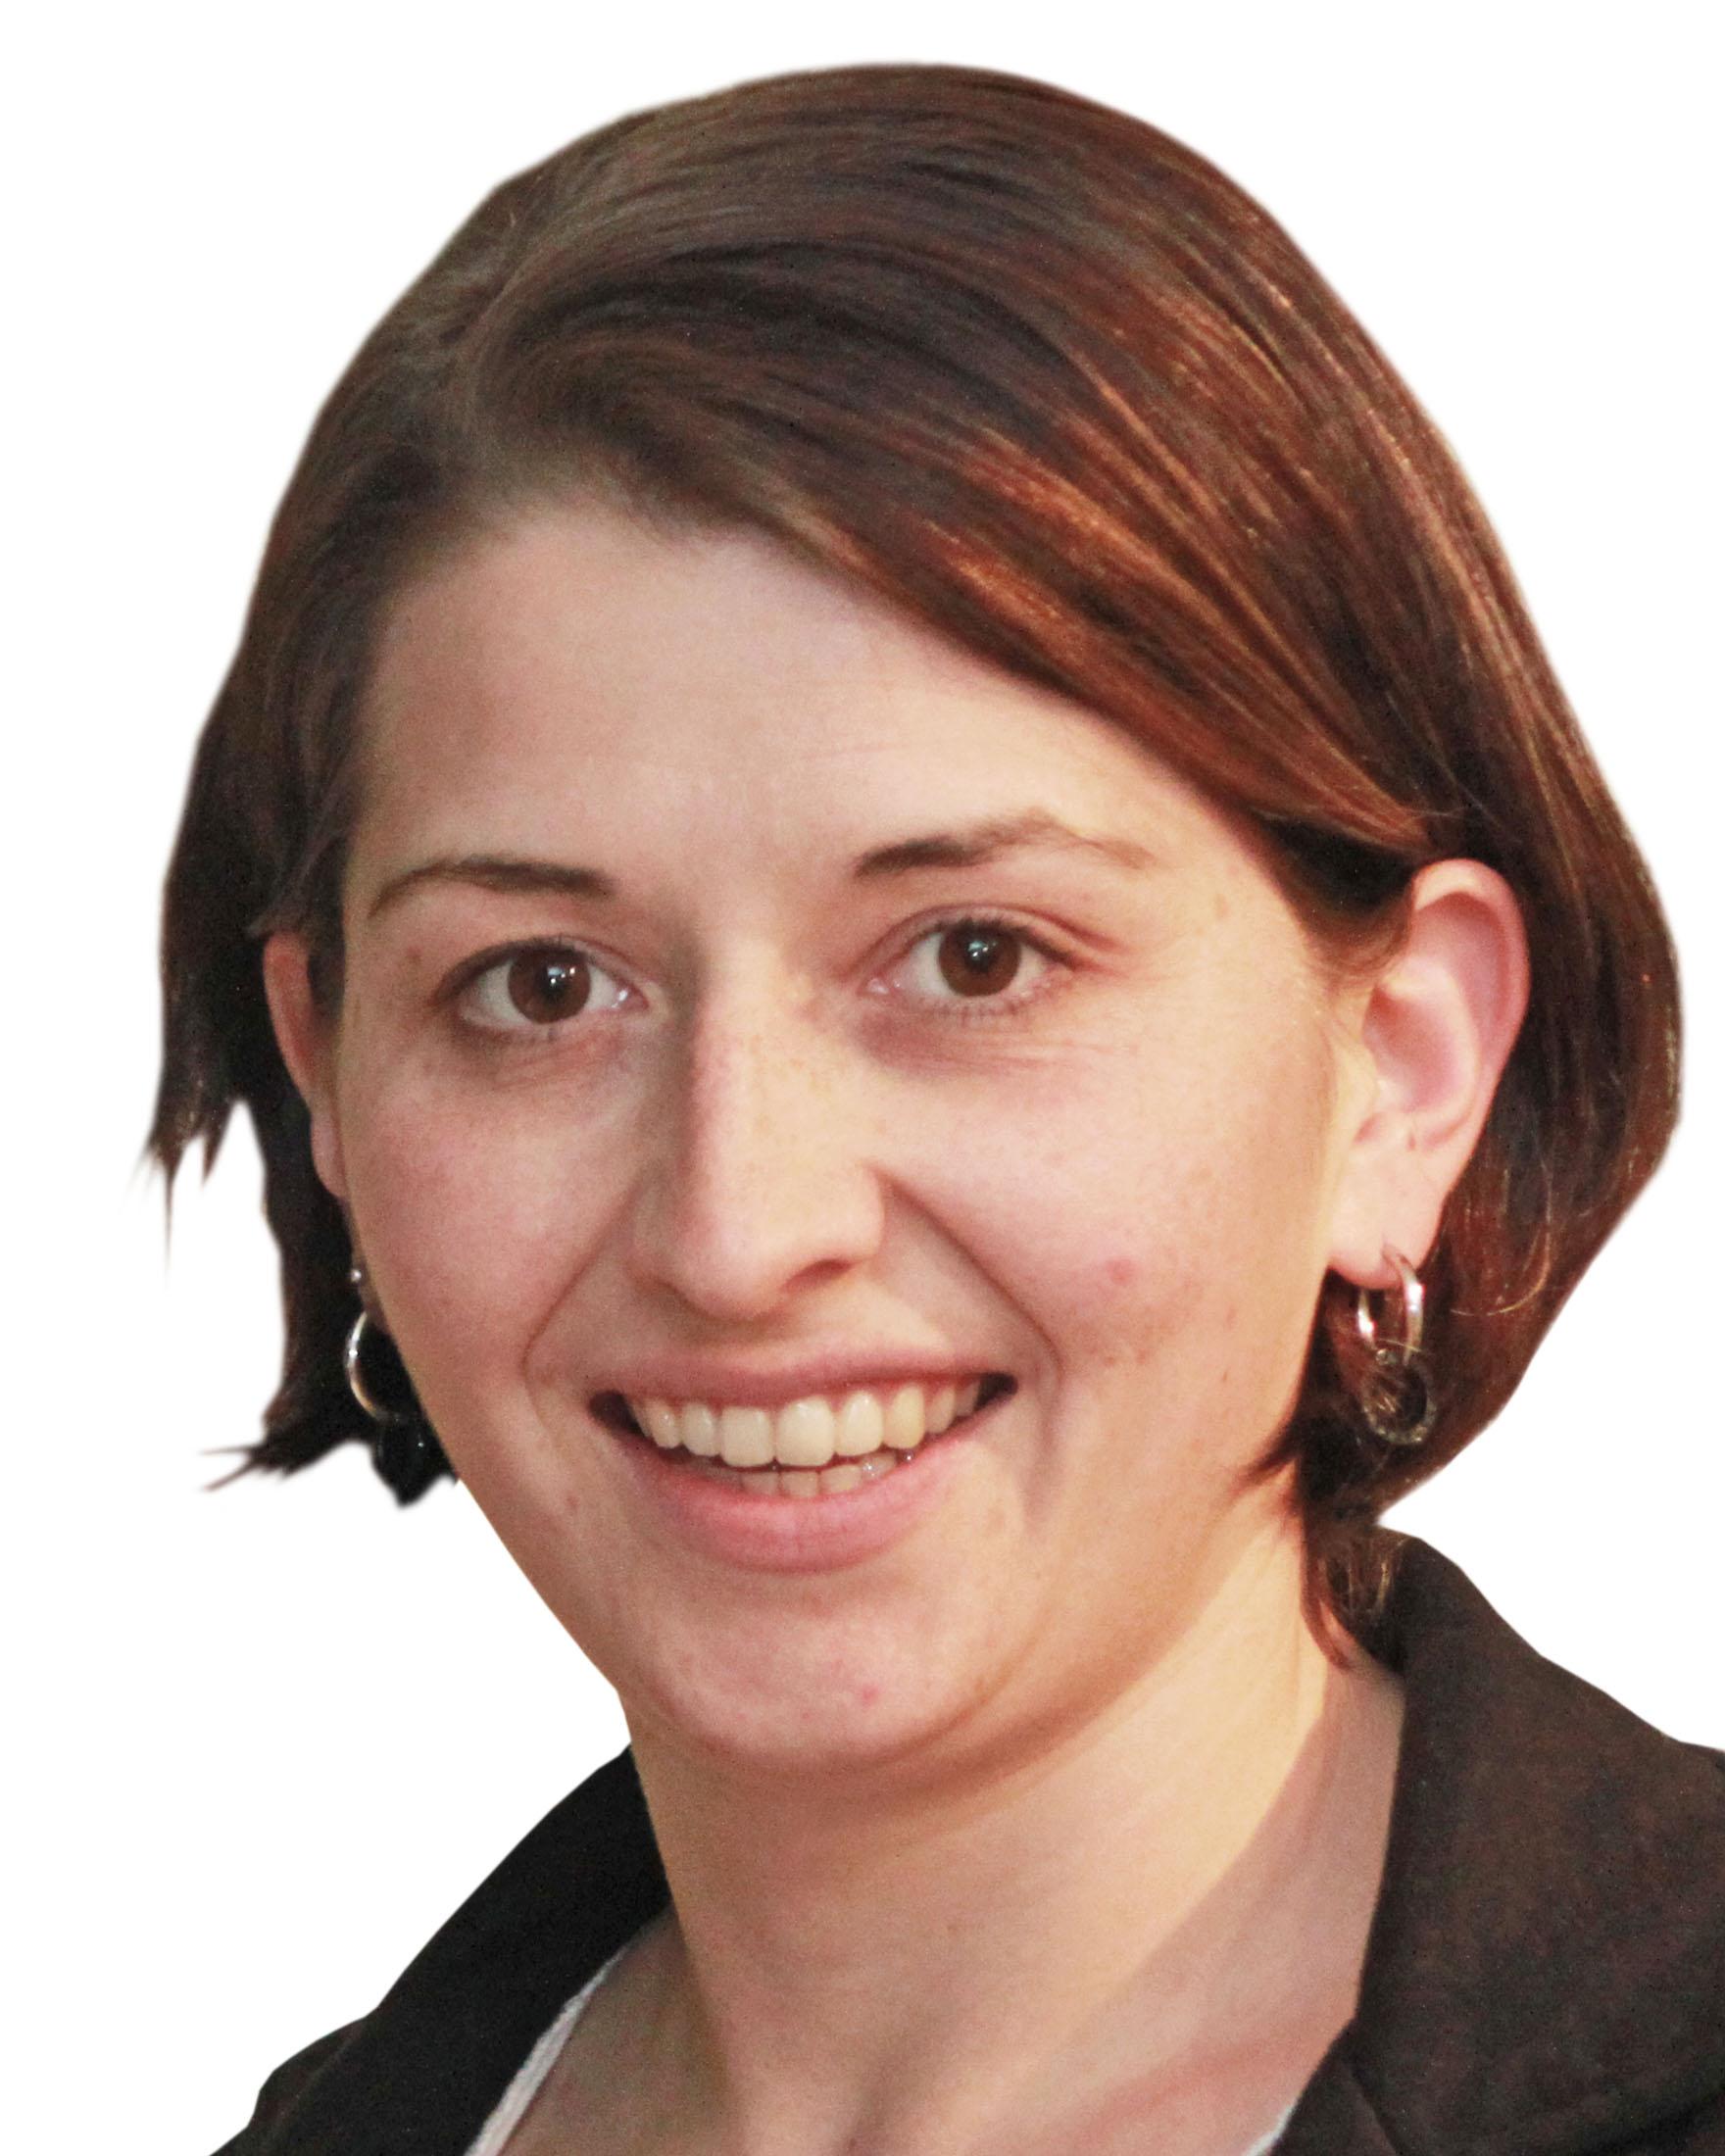 Sofie Haubenwallner